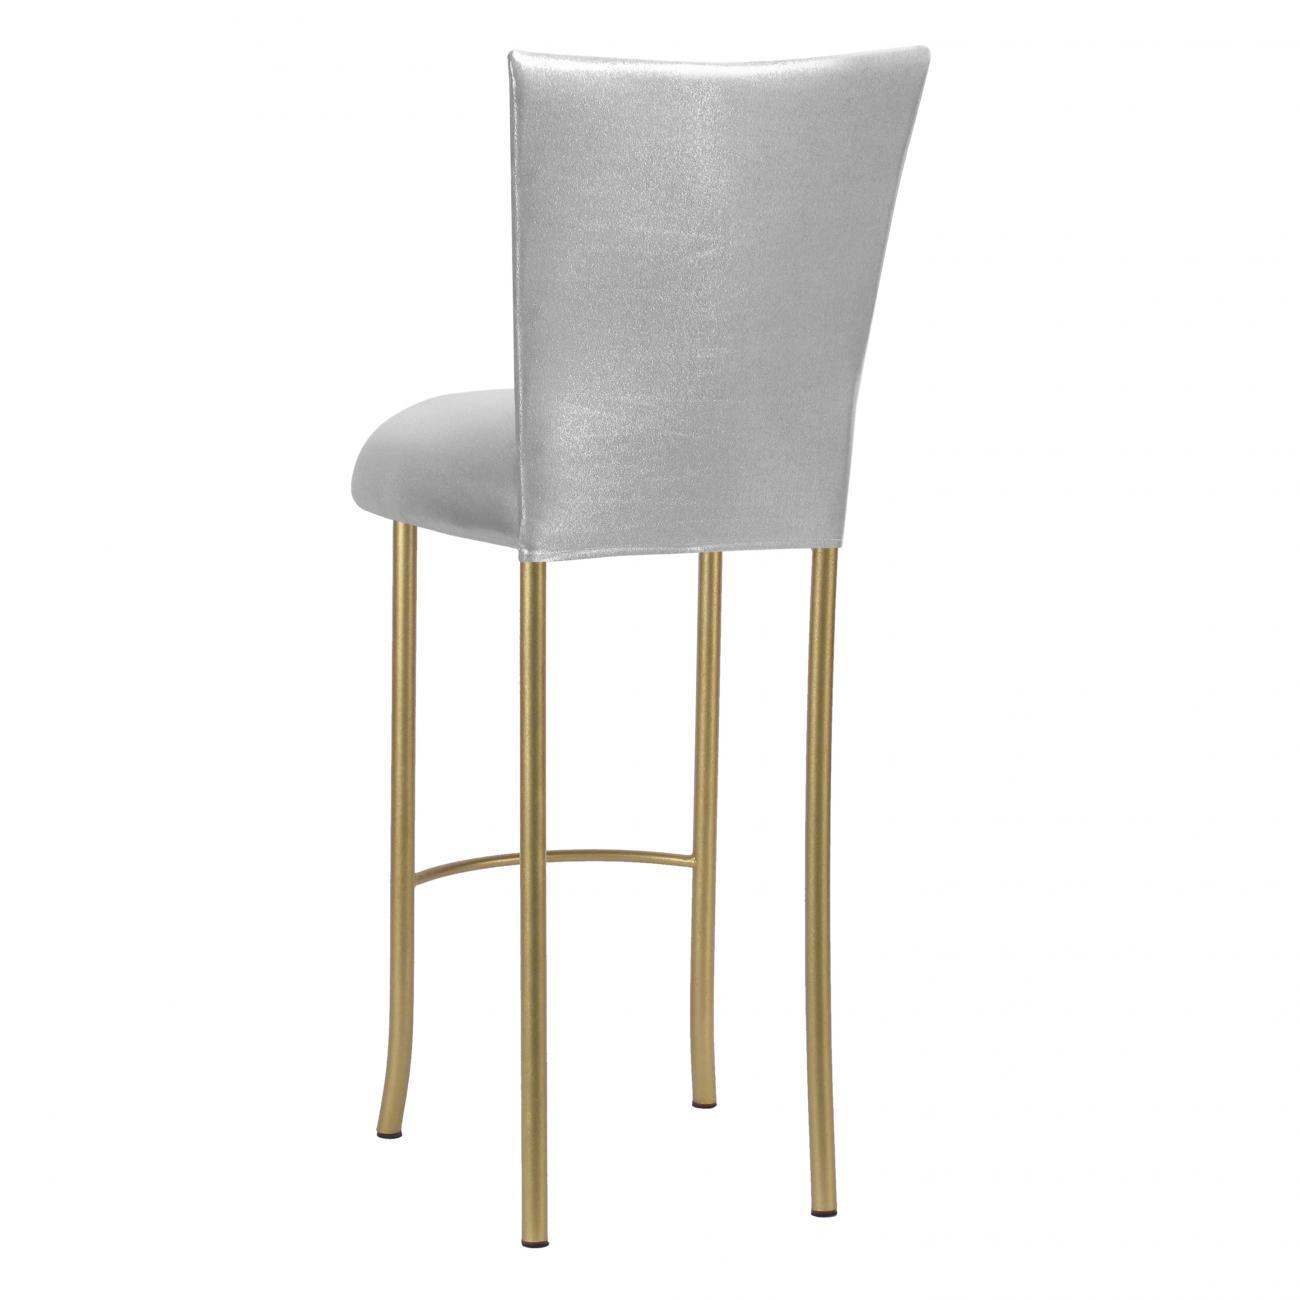 Terrific Metallic Fanfare Chameleon Chair Covers Peak Event Services Beatyapartments Chair Design Images Beatyapartmentscom